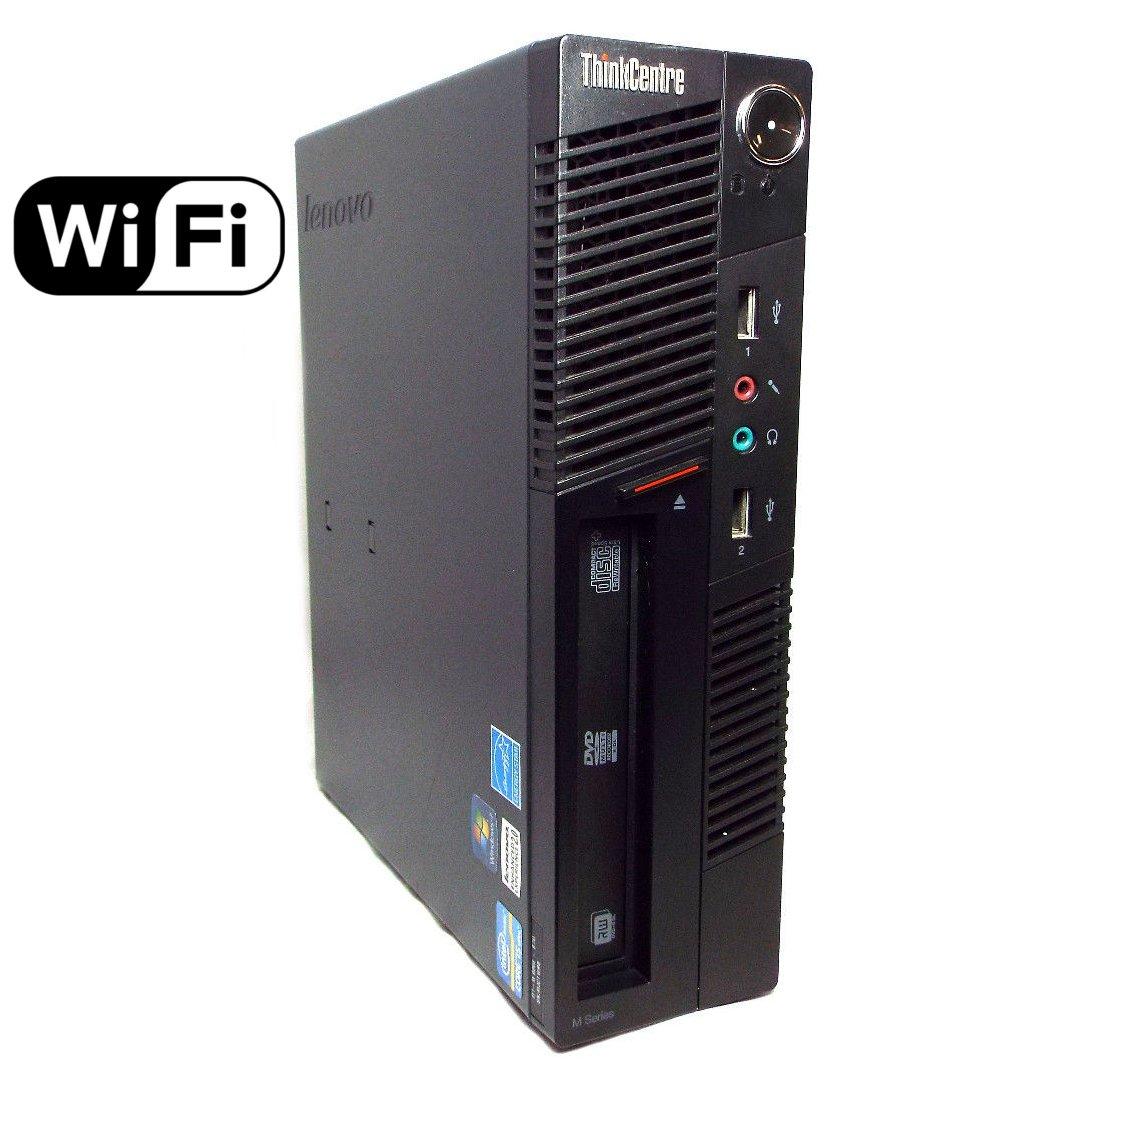 Lenovo ThinkCentre Performance M91P Quad Core